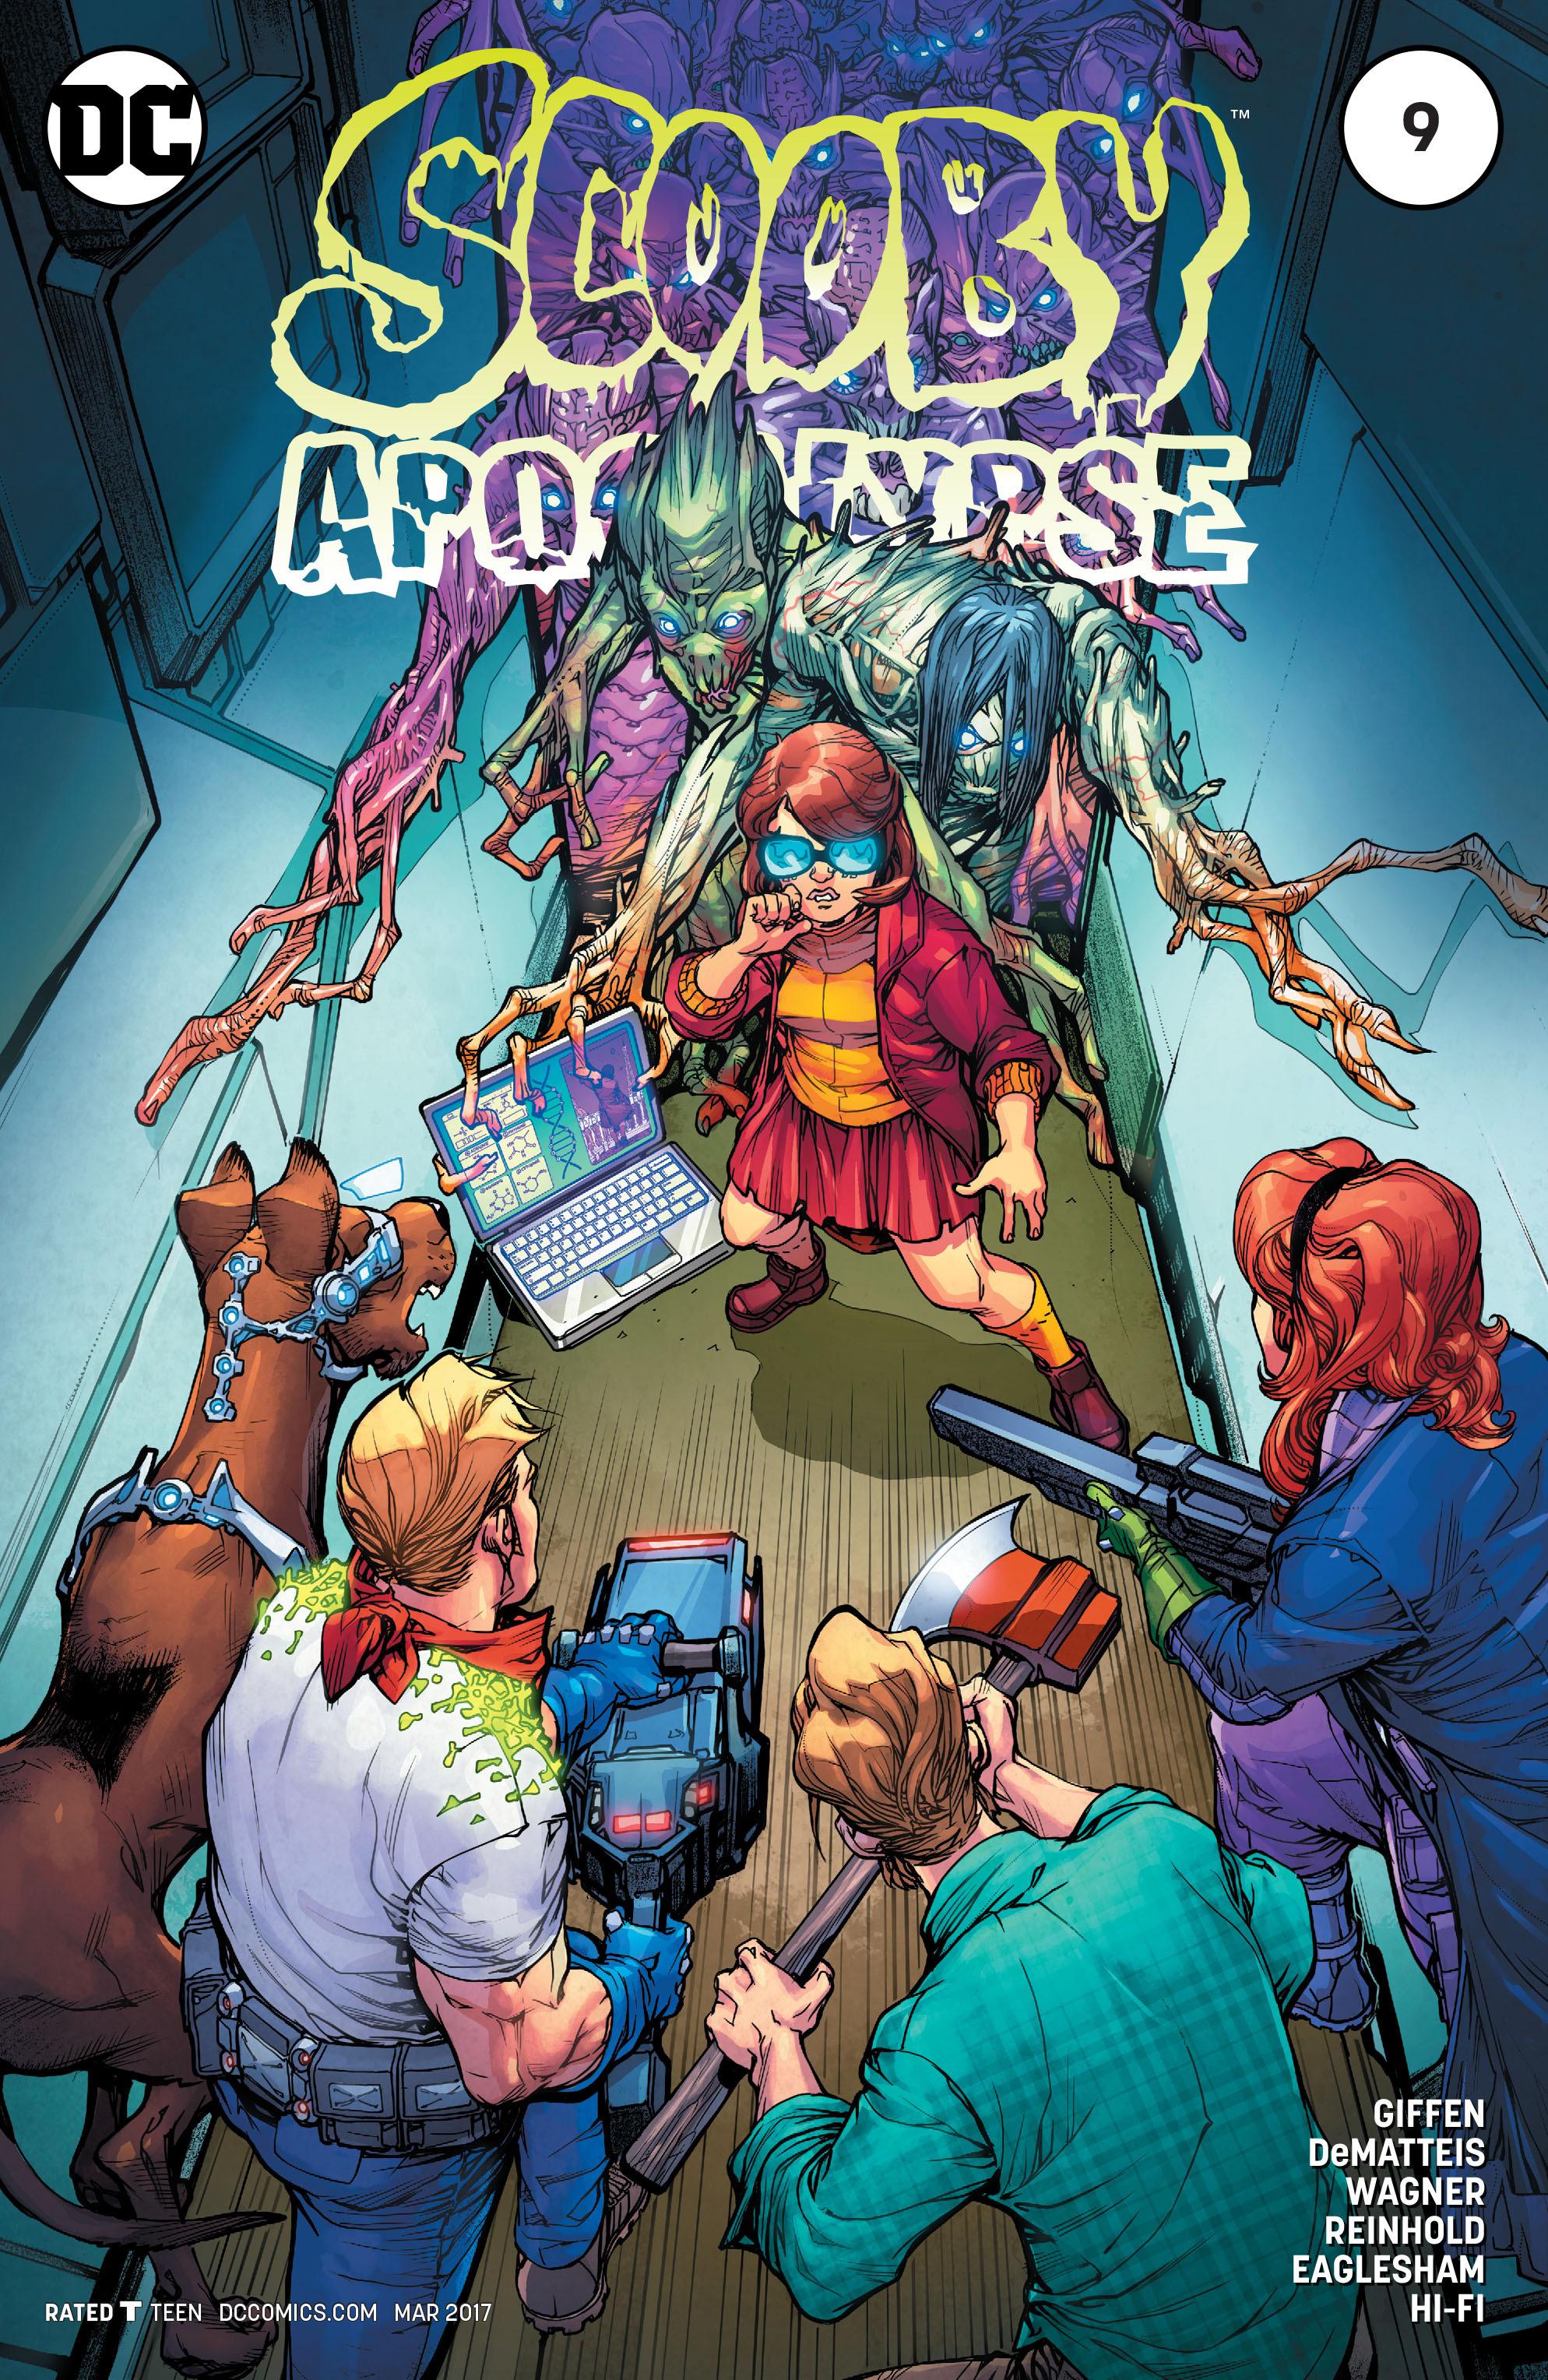 Read online Scooby Apocalypse comic -  Issue #9 - 1